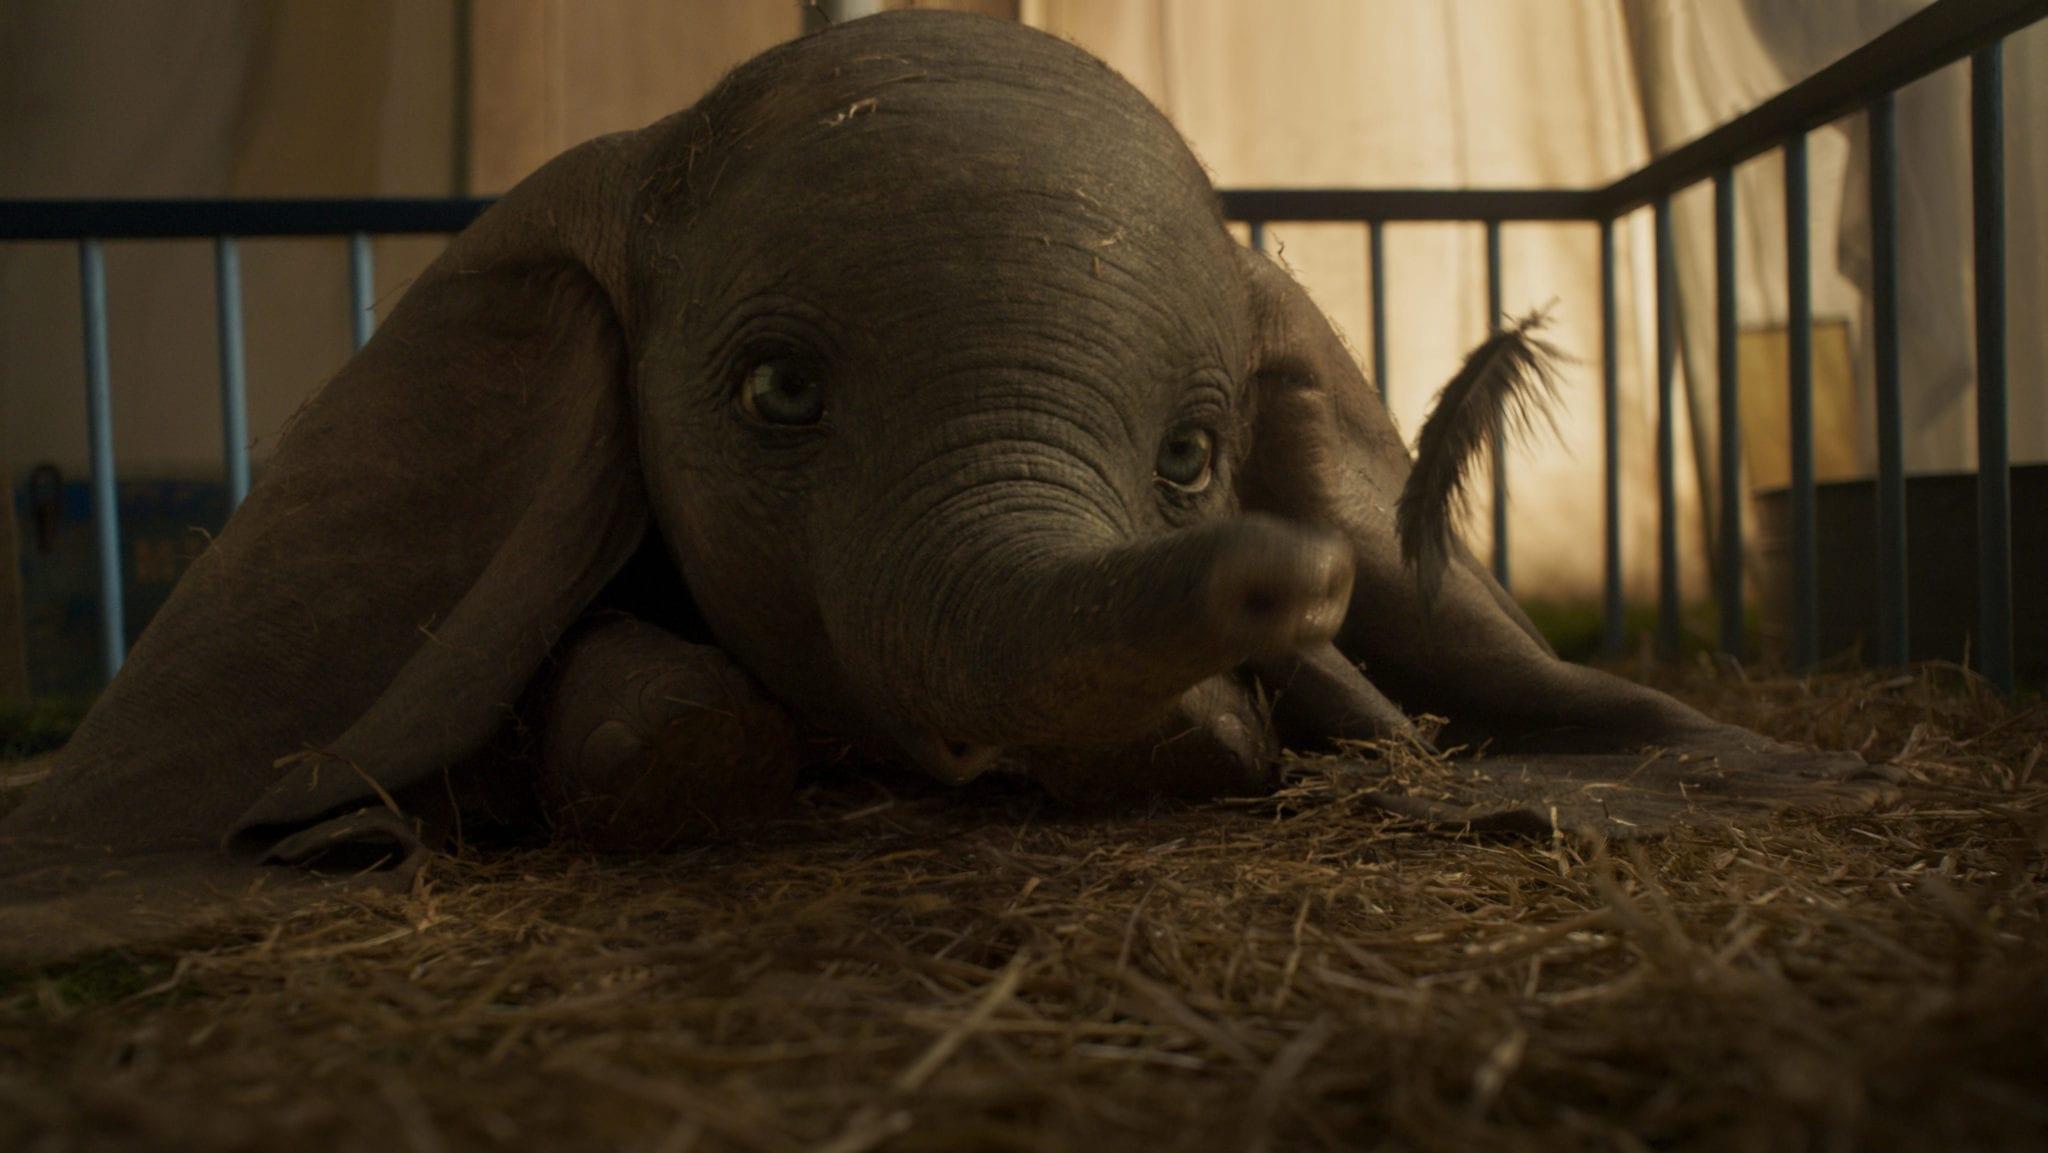 Dumbo - KINOFILME AB 28.03.2019